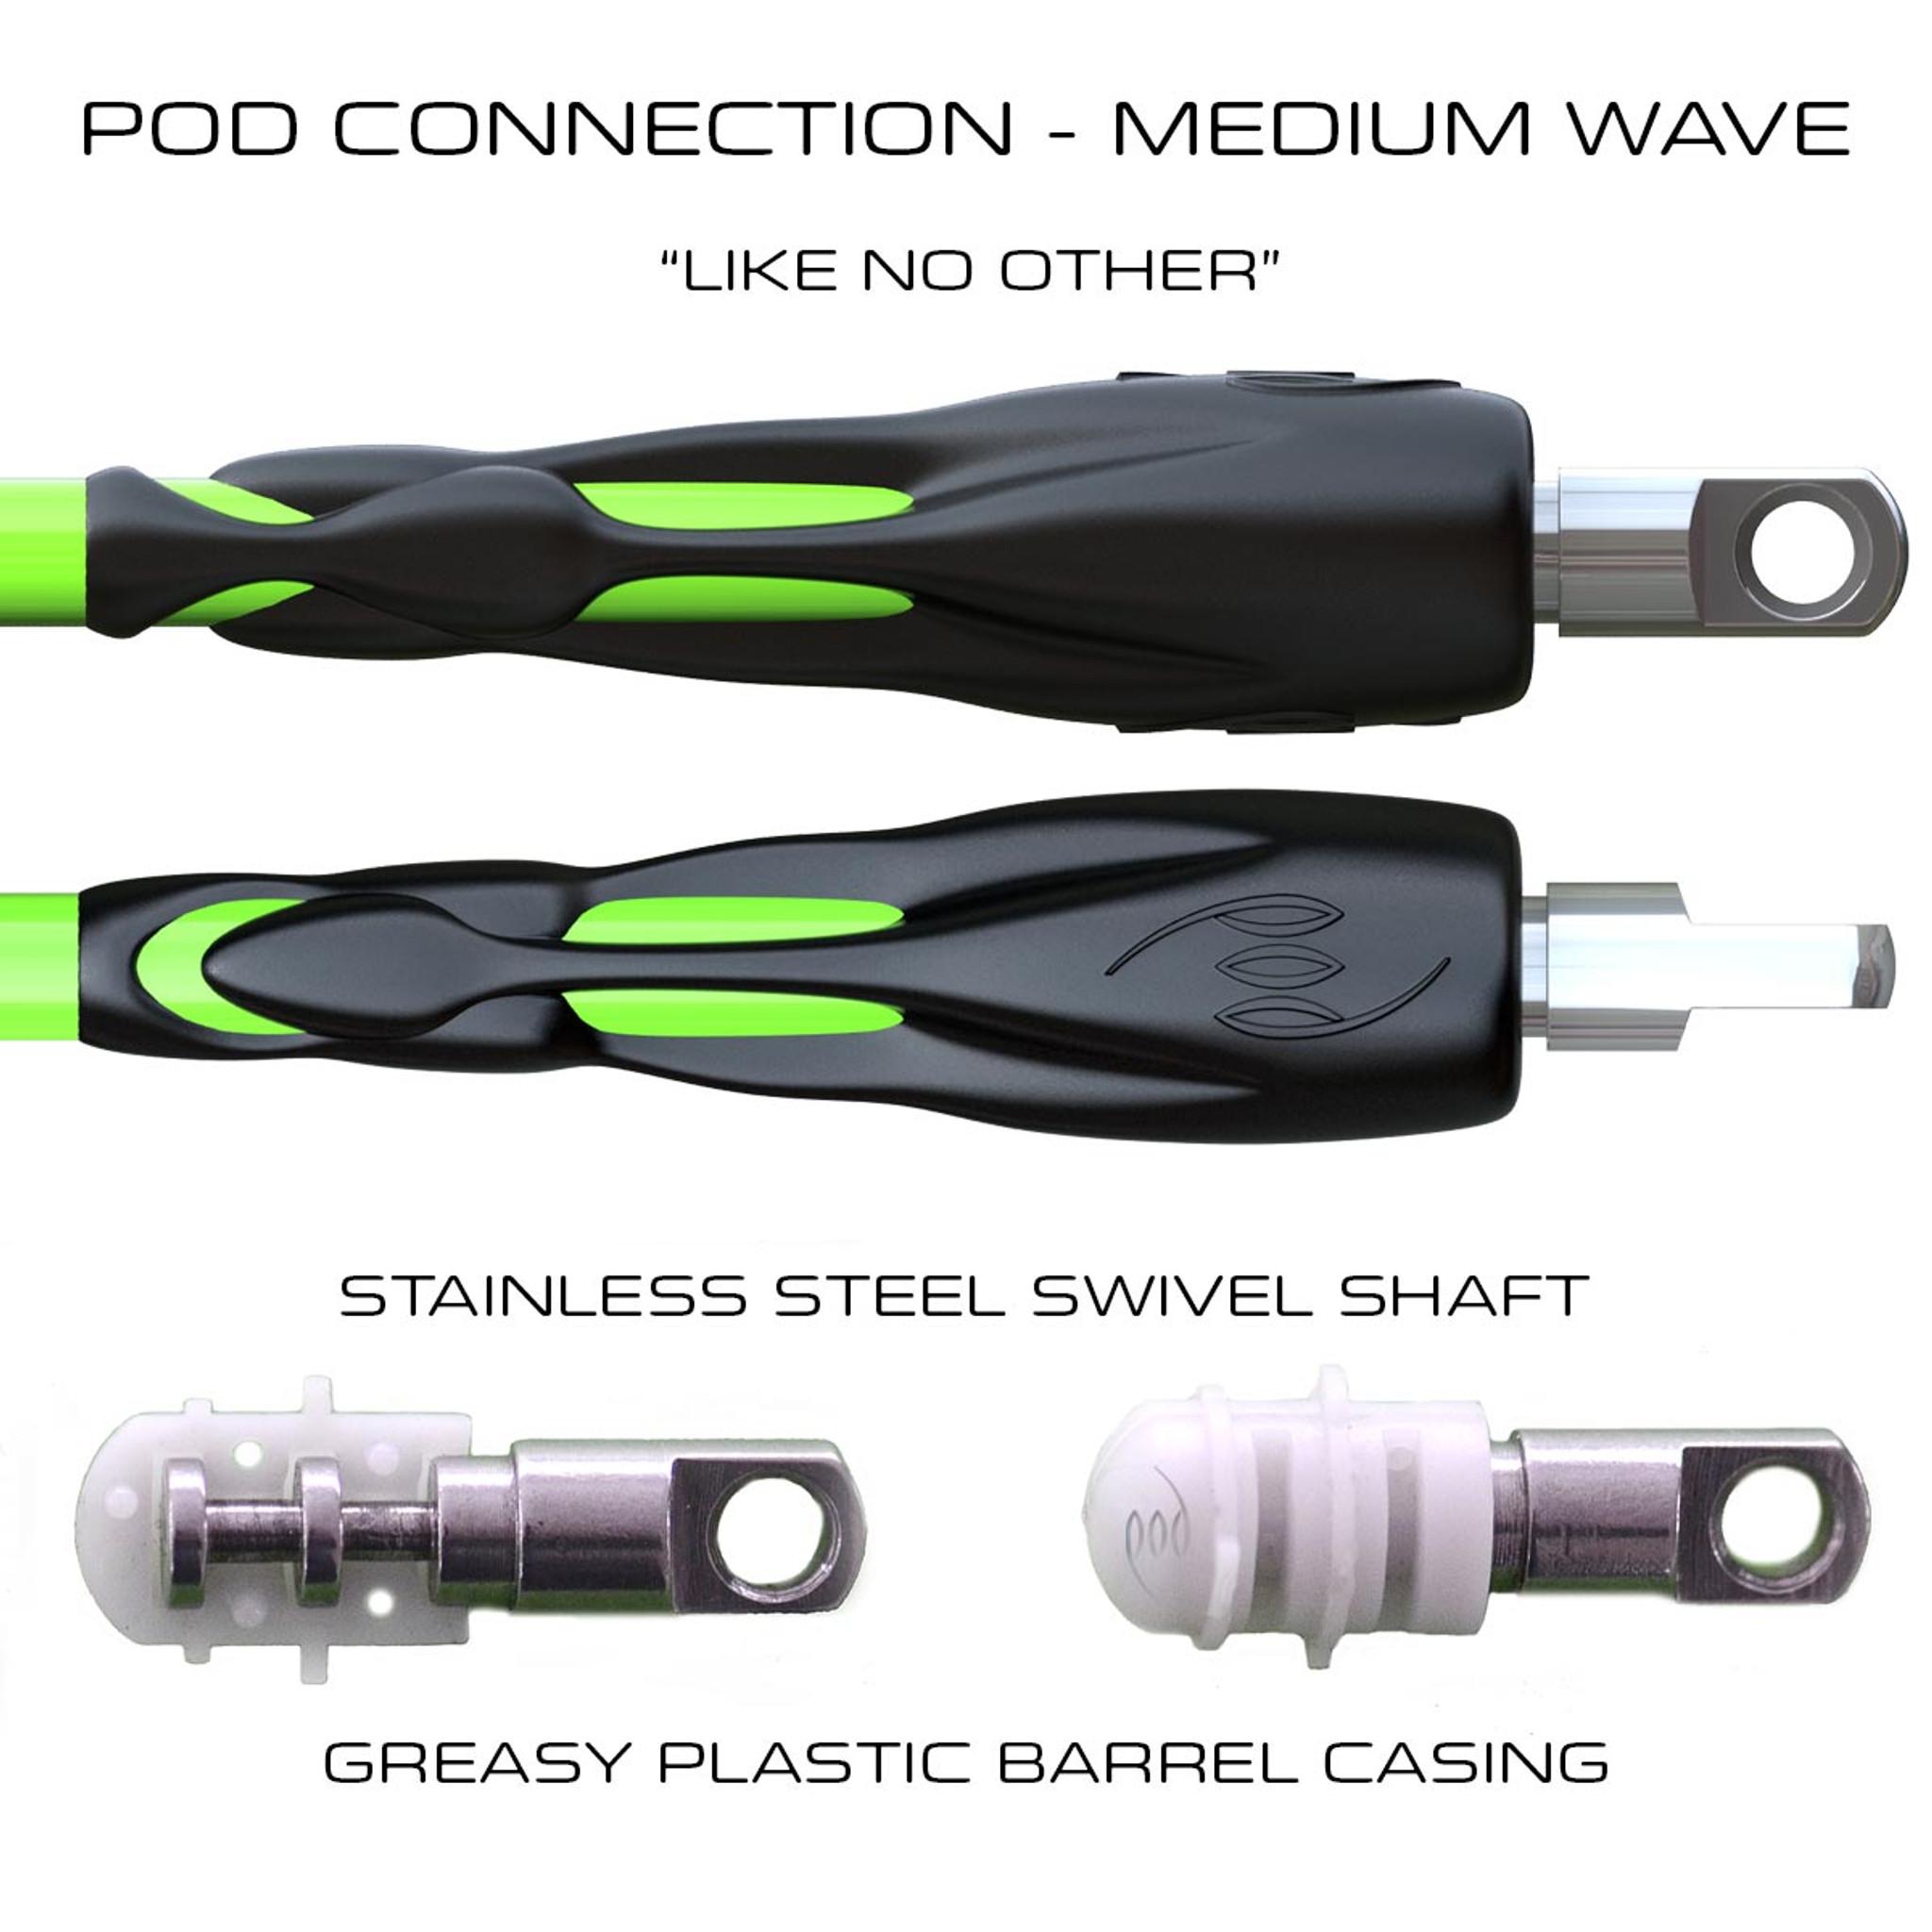 POD Connection 8ft Leg Ropes - Surfing Medium Waves